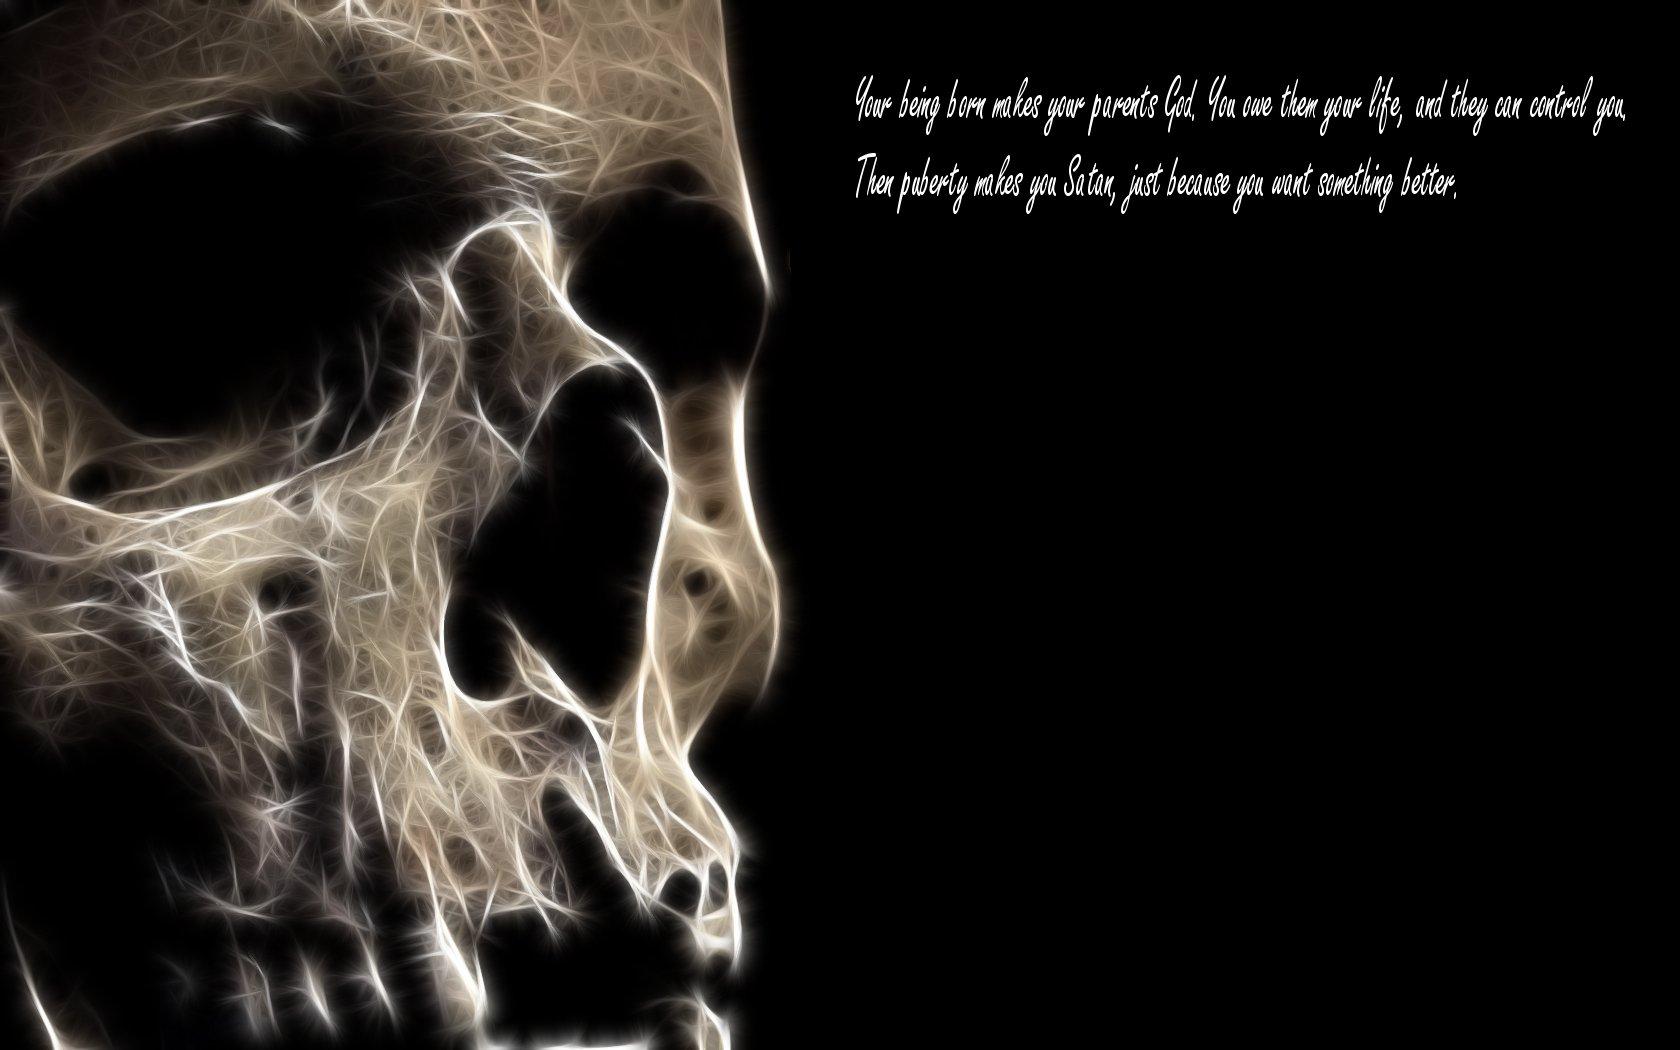 Skull quote #1